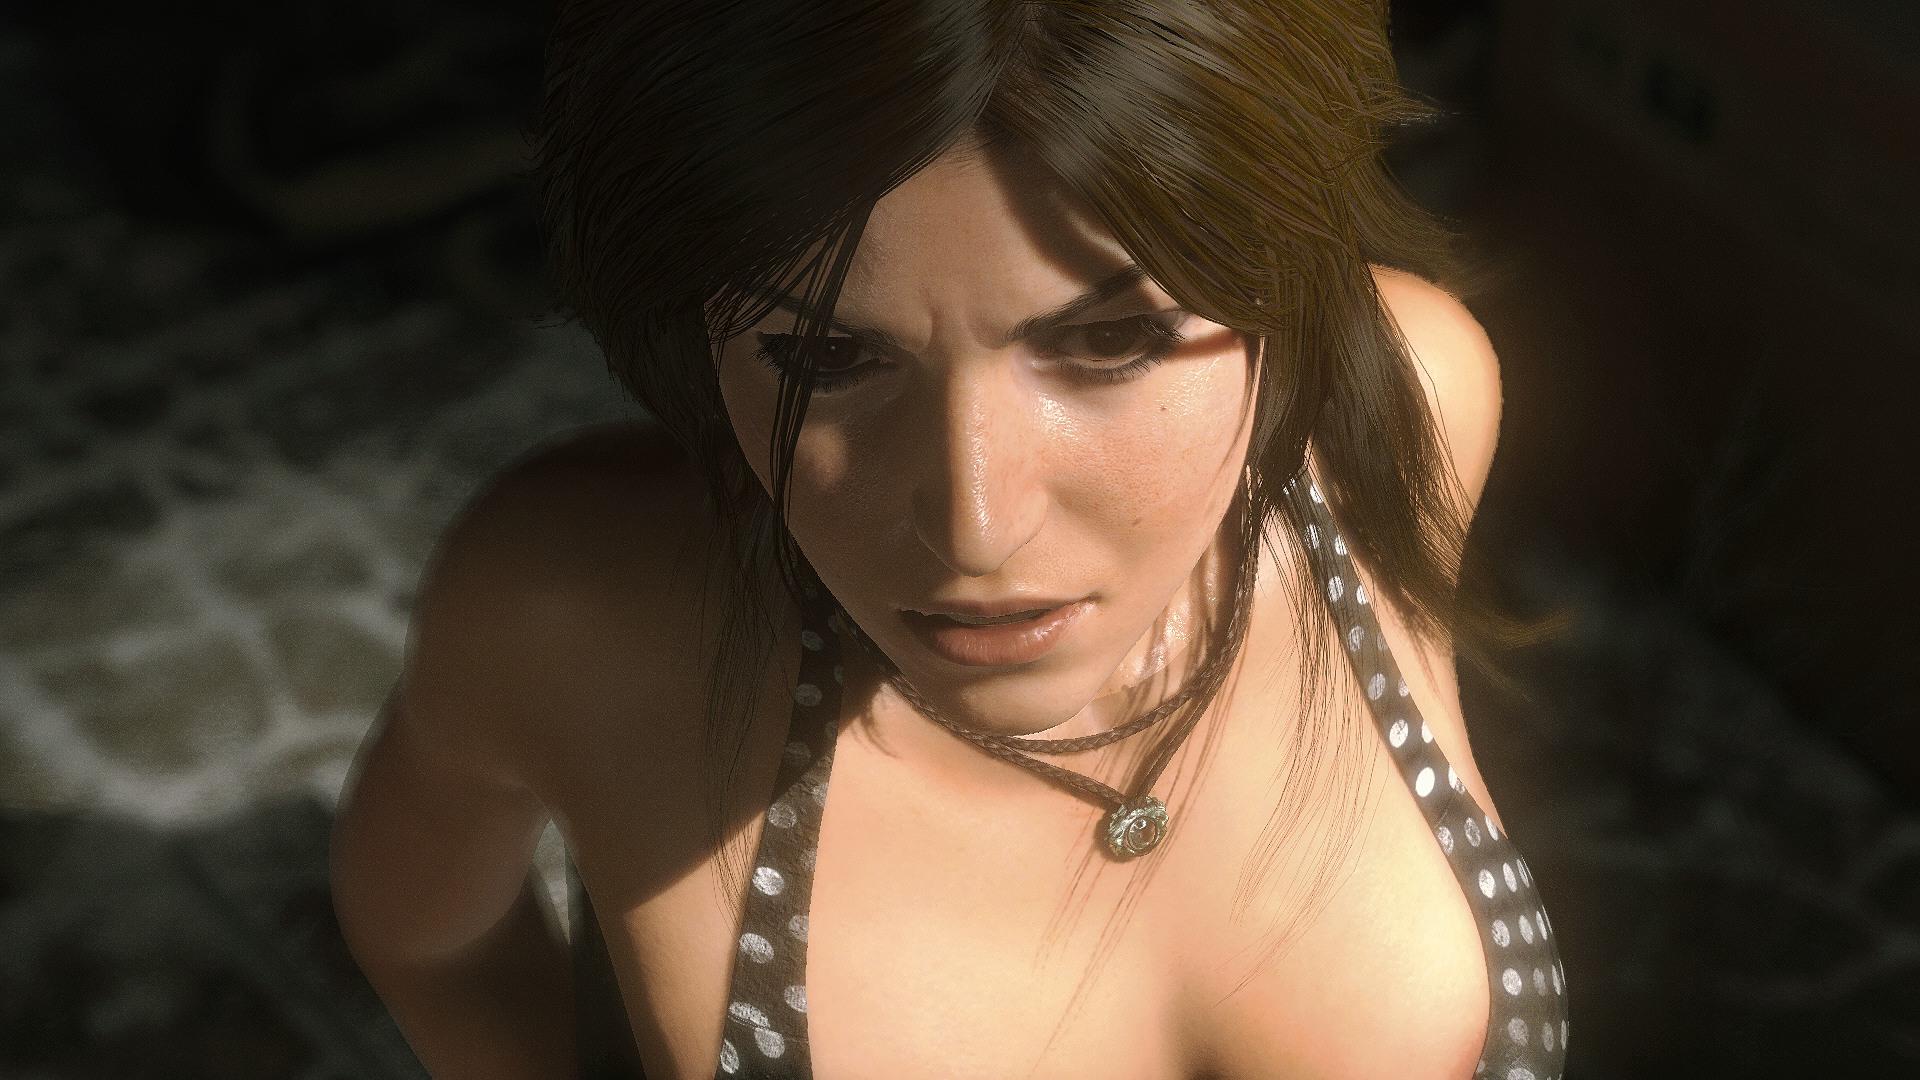 1_41_07.jpg - Rise of the Tomb Raider